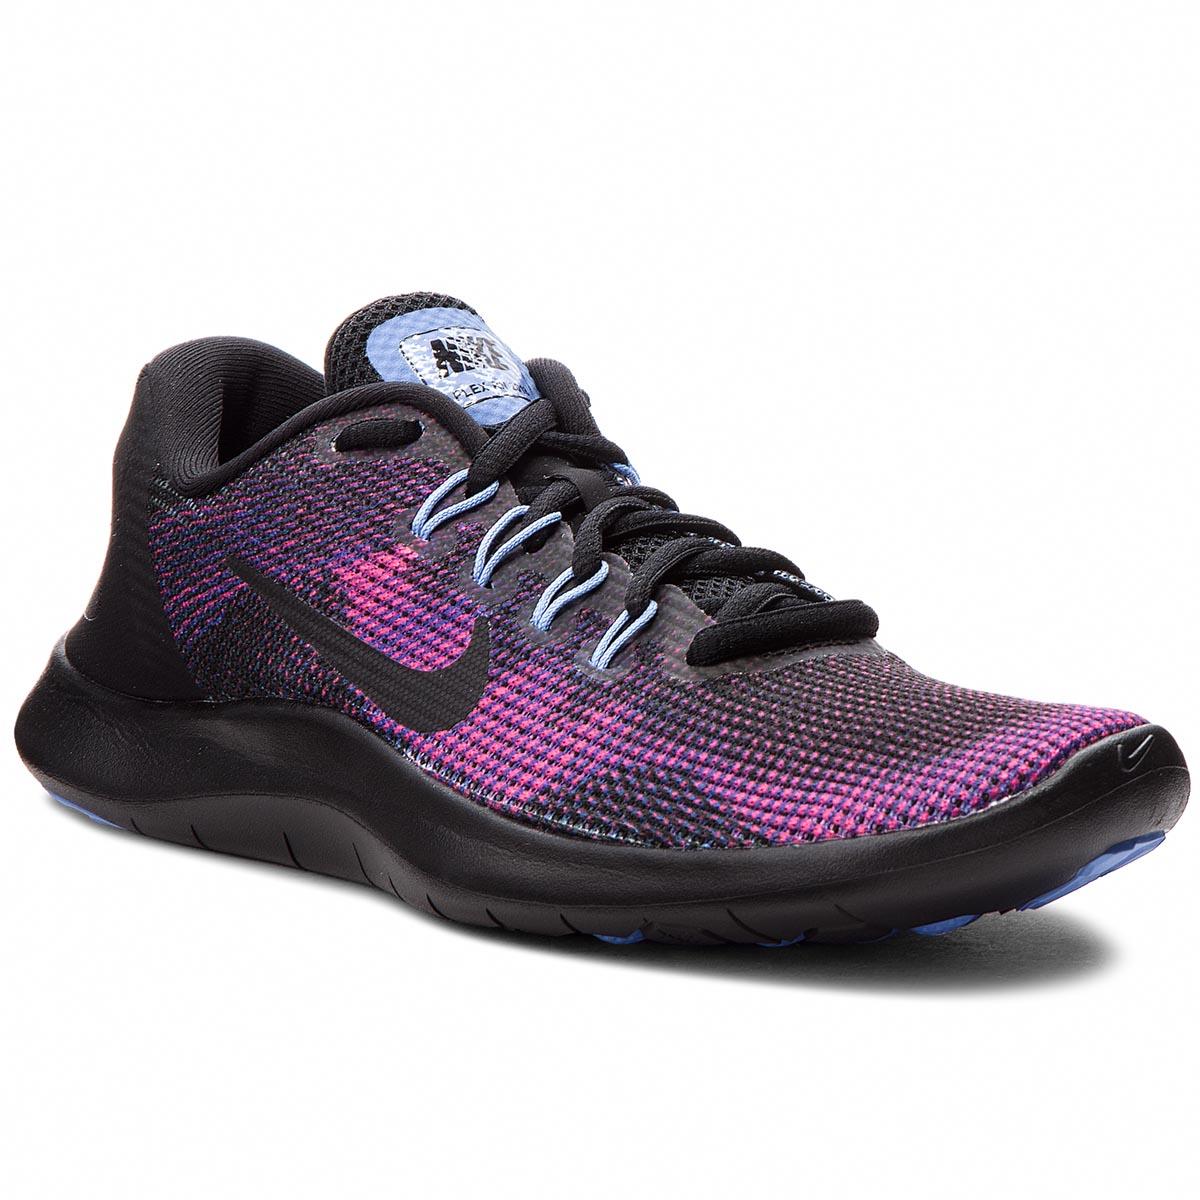 finest selection 7445f c903b Shoes NIKE Flex 2018 Rn AA7408 003 Black Black Royal Pulse